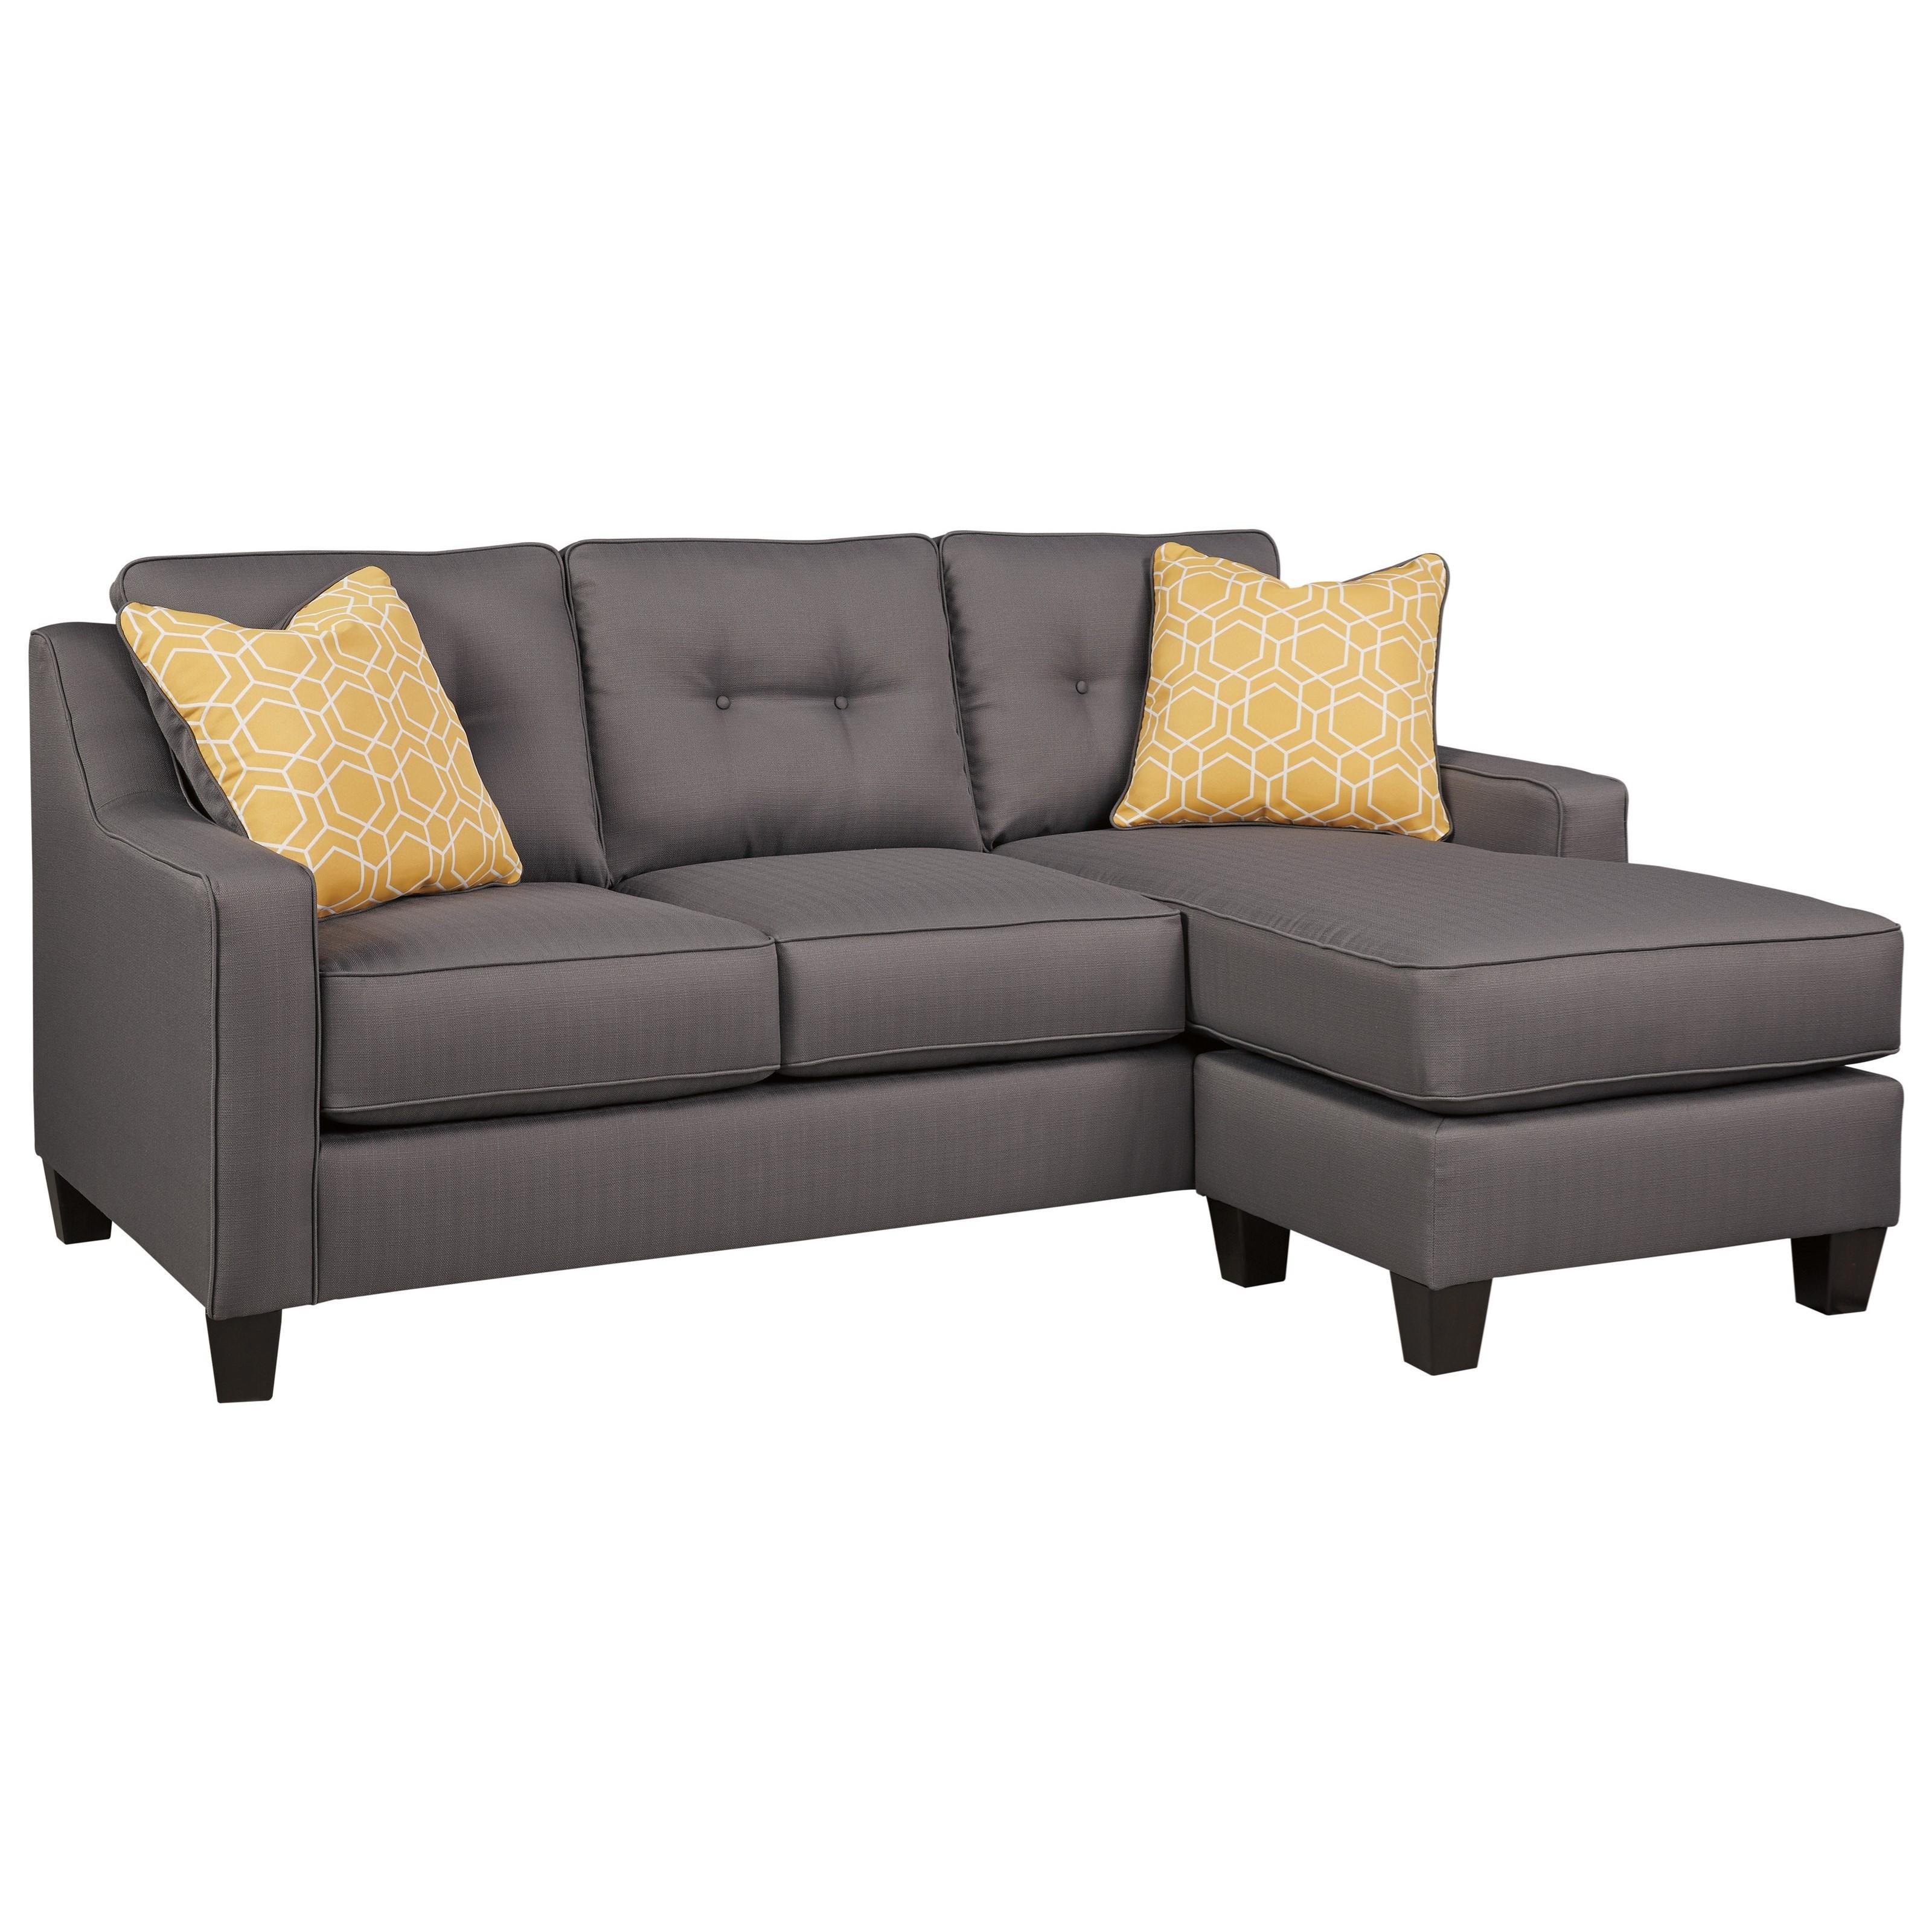 Benchcraft aldie nuvella 6870218 contemporary sofa chaise for Divan vs chaise